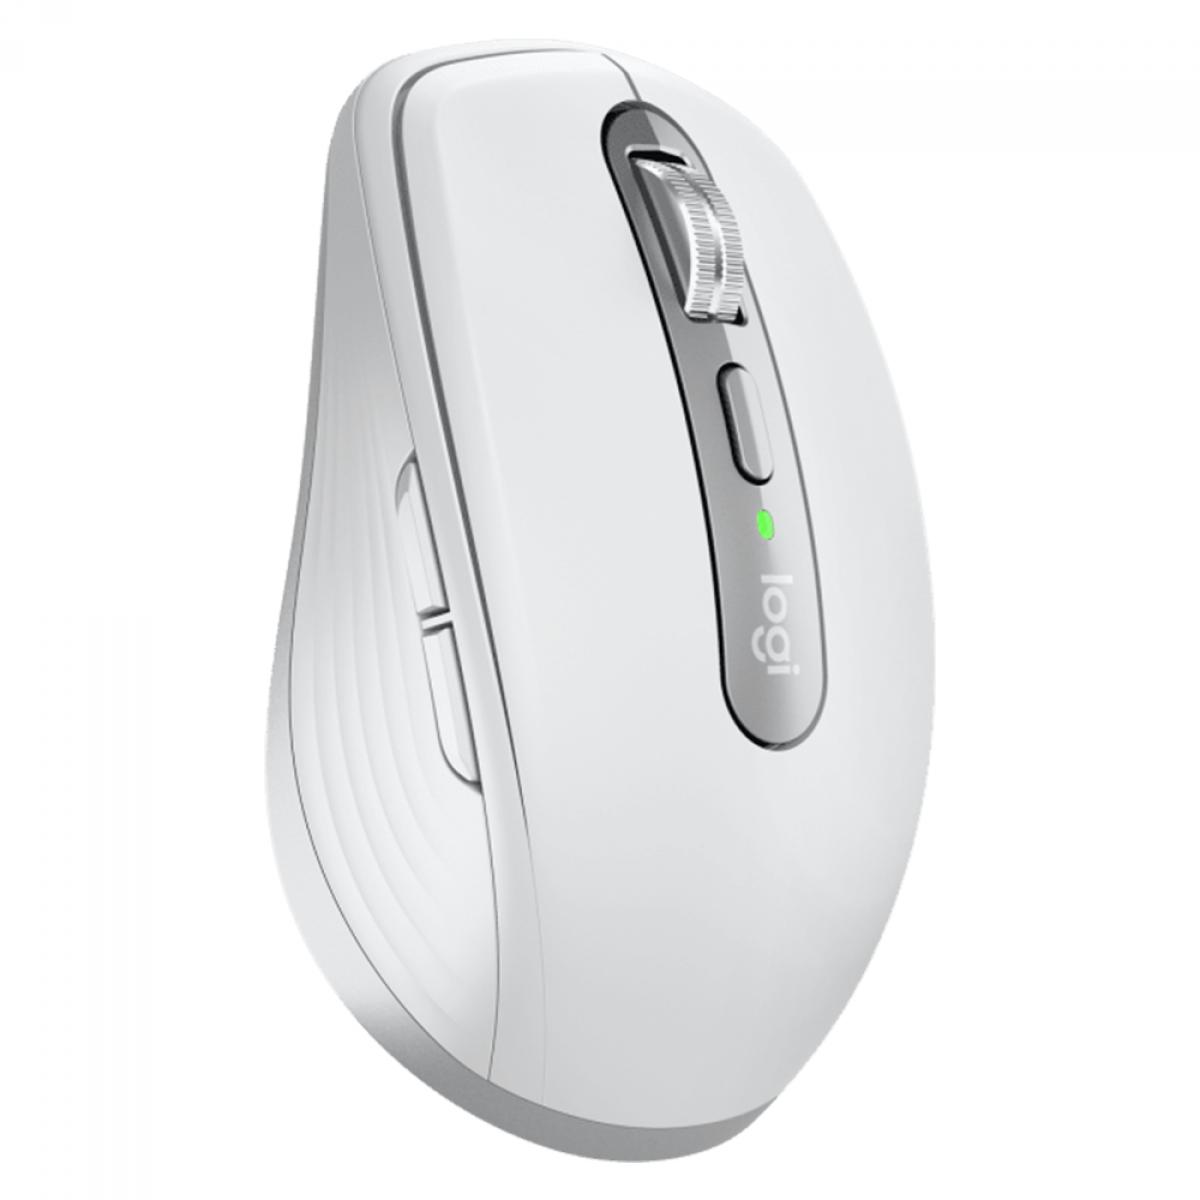 Mouse Logitech MX Anywhere 3 Wireless, 4000 DPI, 6 Botões, White, 910-005993